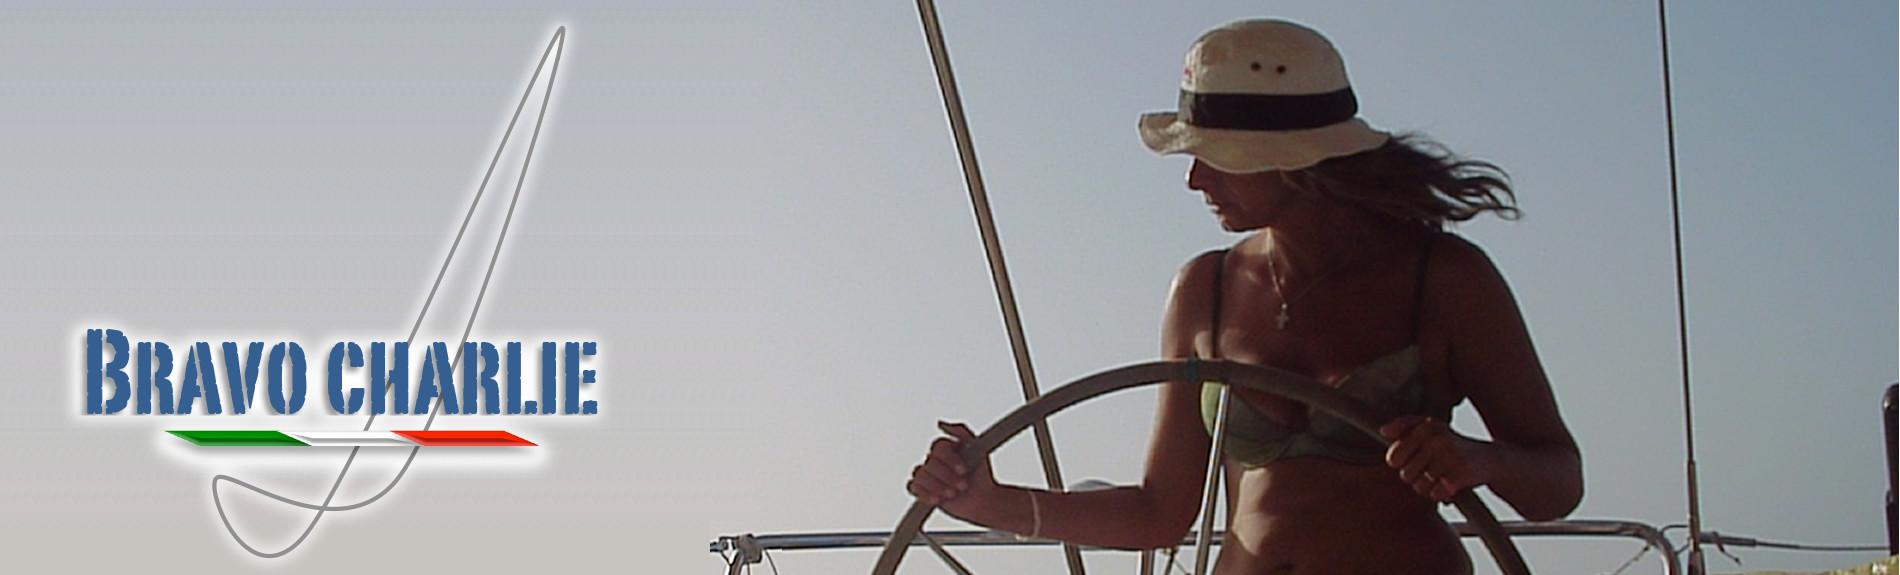 Noleggio Barche 3